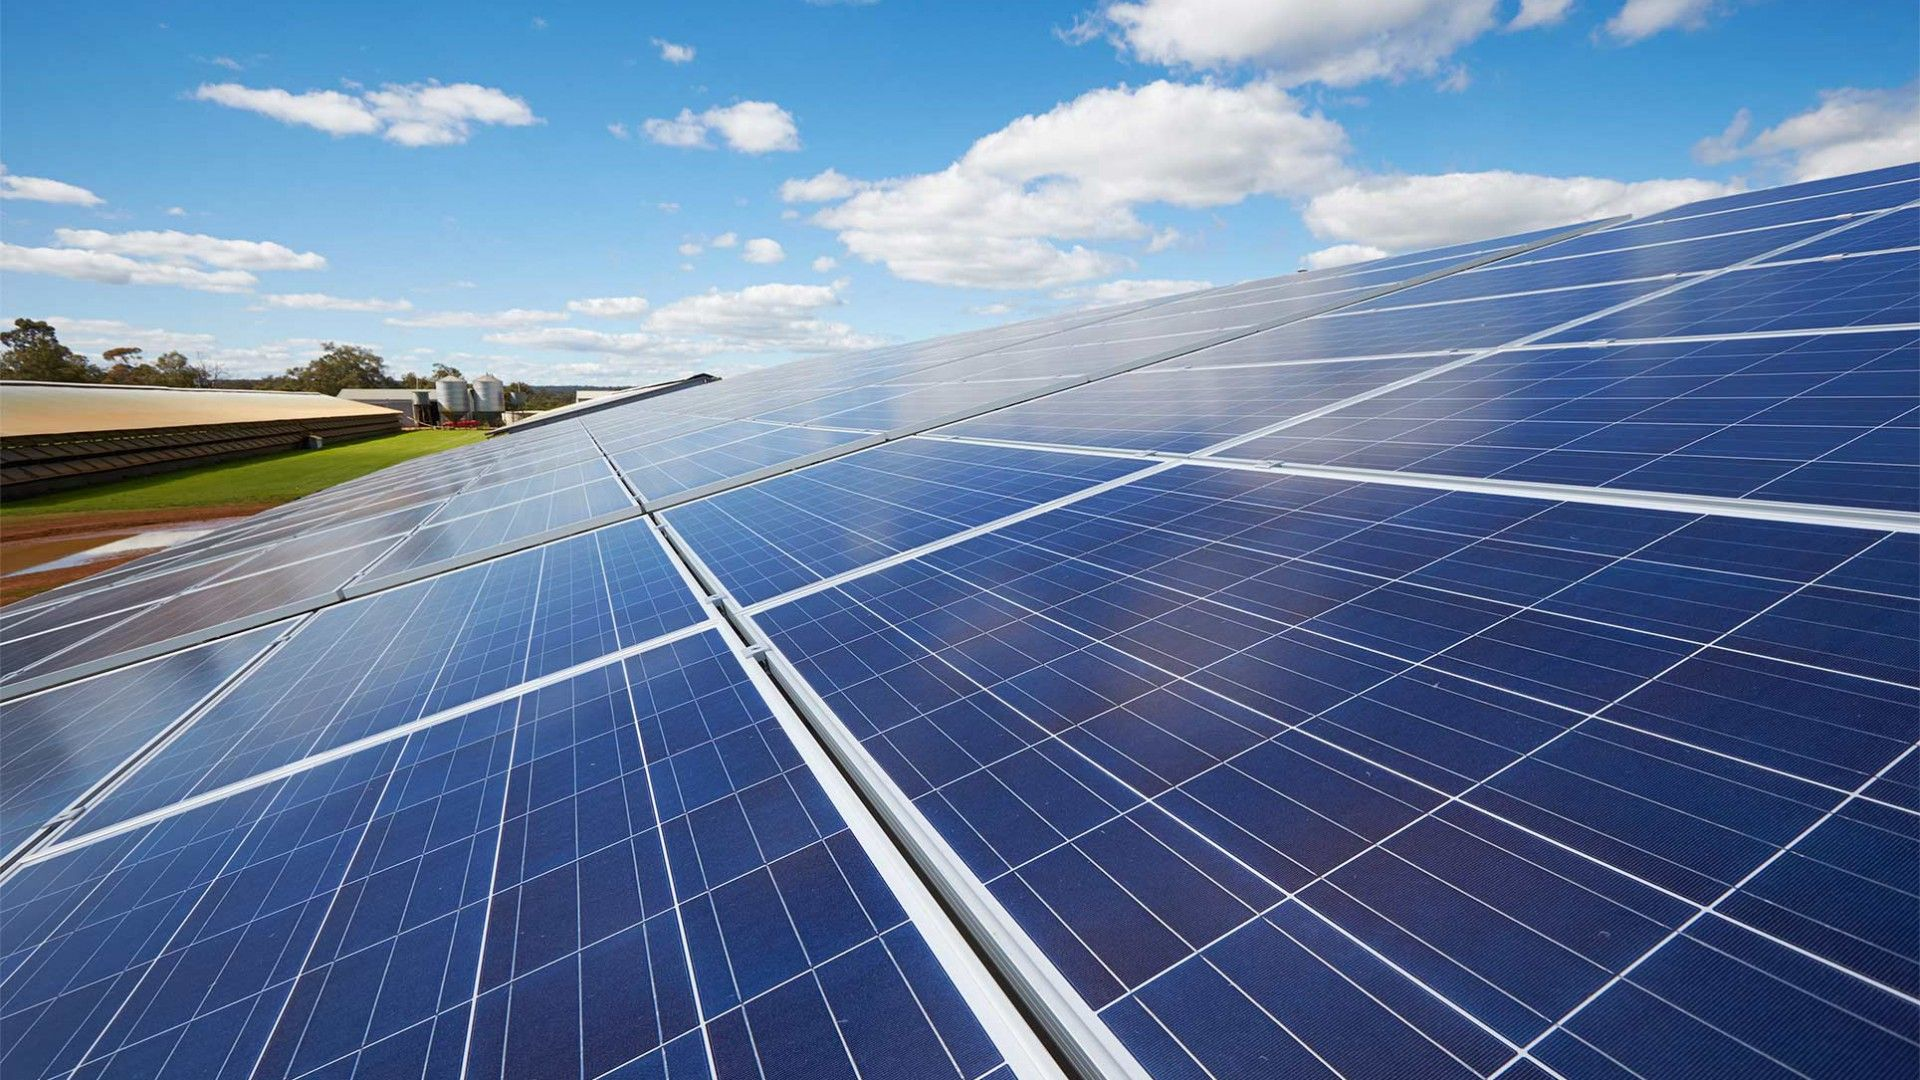 Amanda Energy is one of Australia's leading wholesale